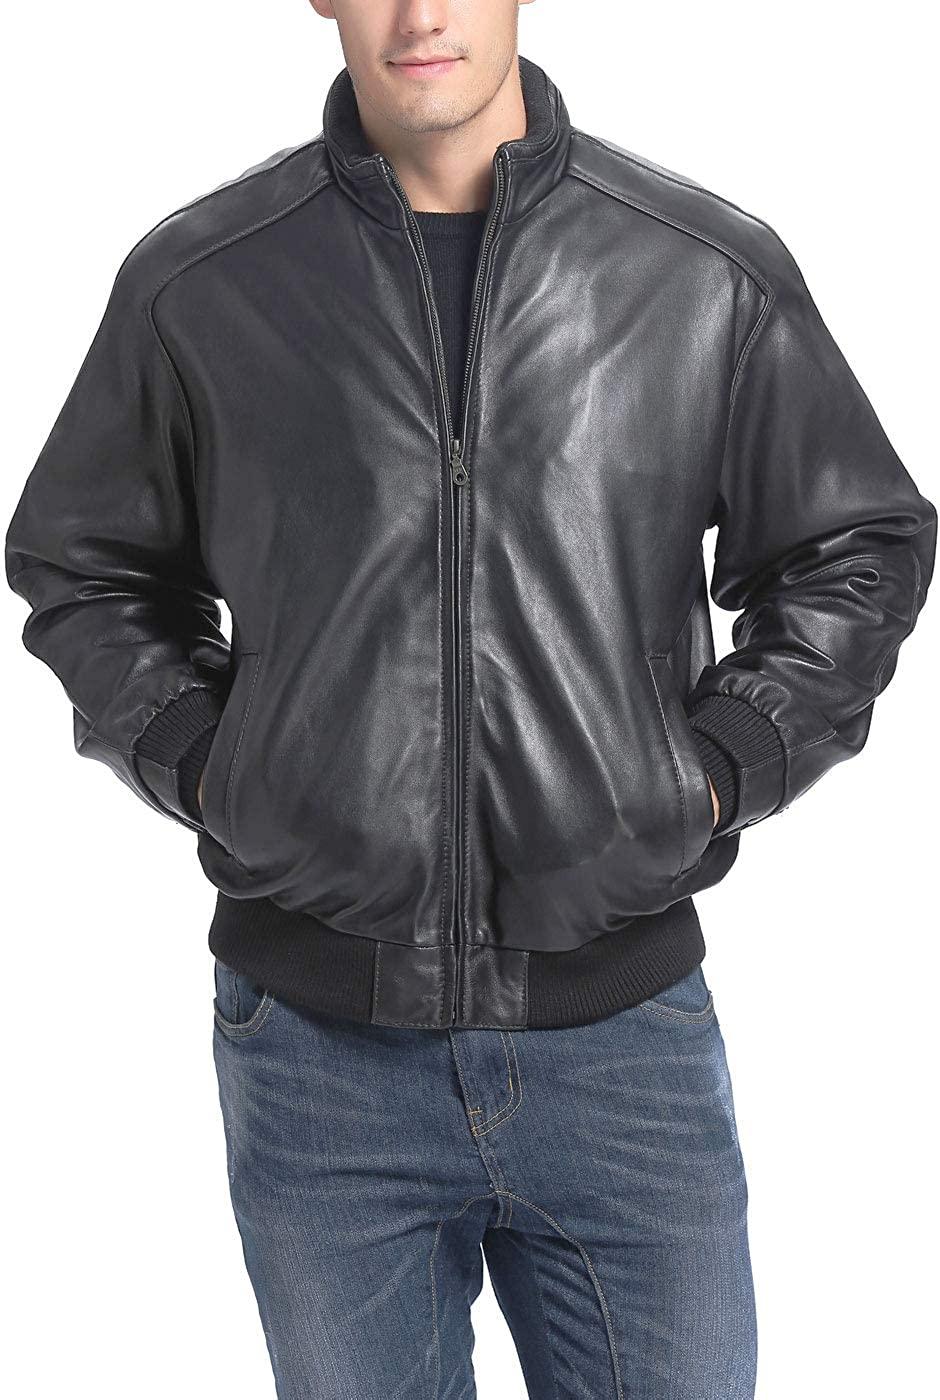 Bgsd Men S City Lambskin Leather Bomber Jacket Regular And Big Tall At Amazon Men S Clothing Store Leather Bomber Bomber Jacket Leather Bomber Jacket [ 1400 x 940 Pixel ]